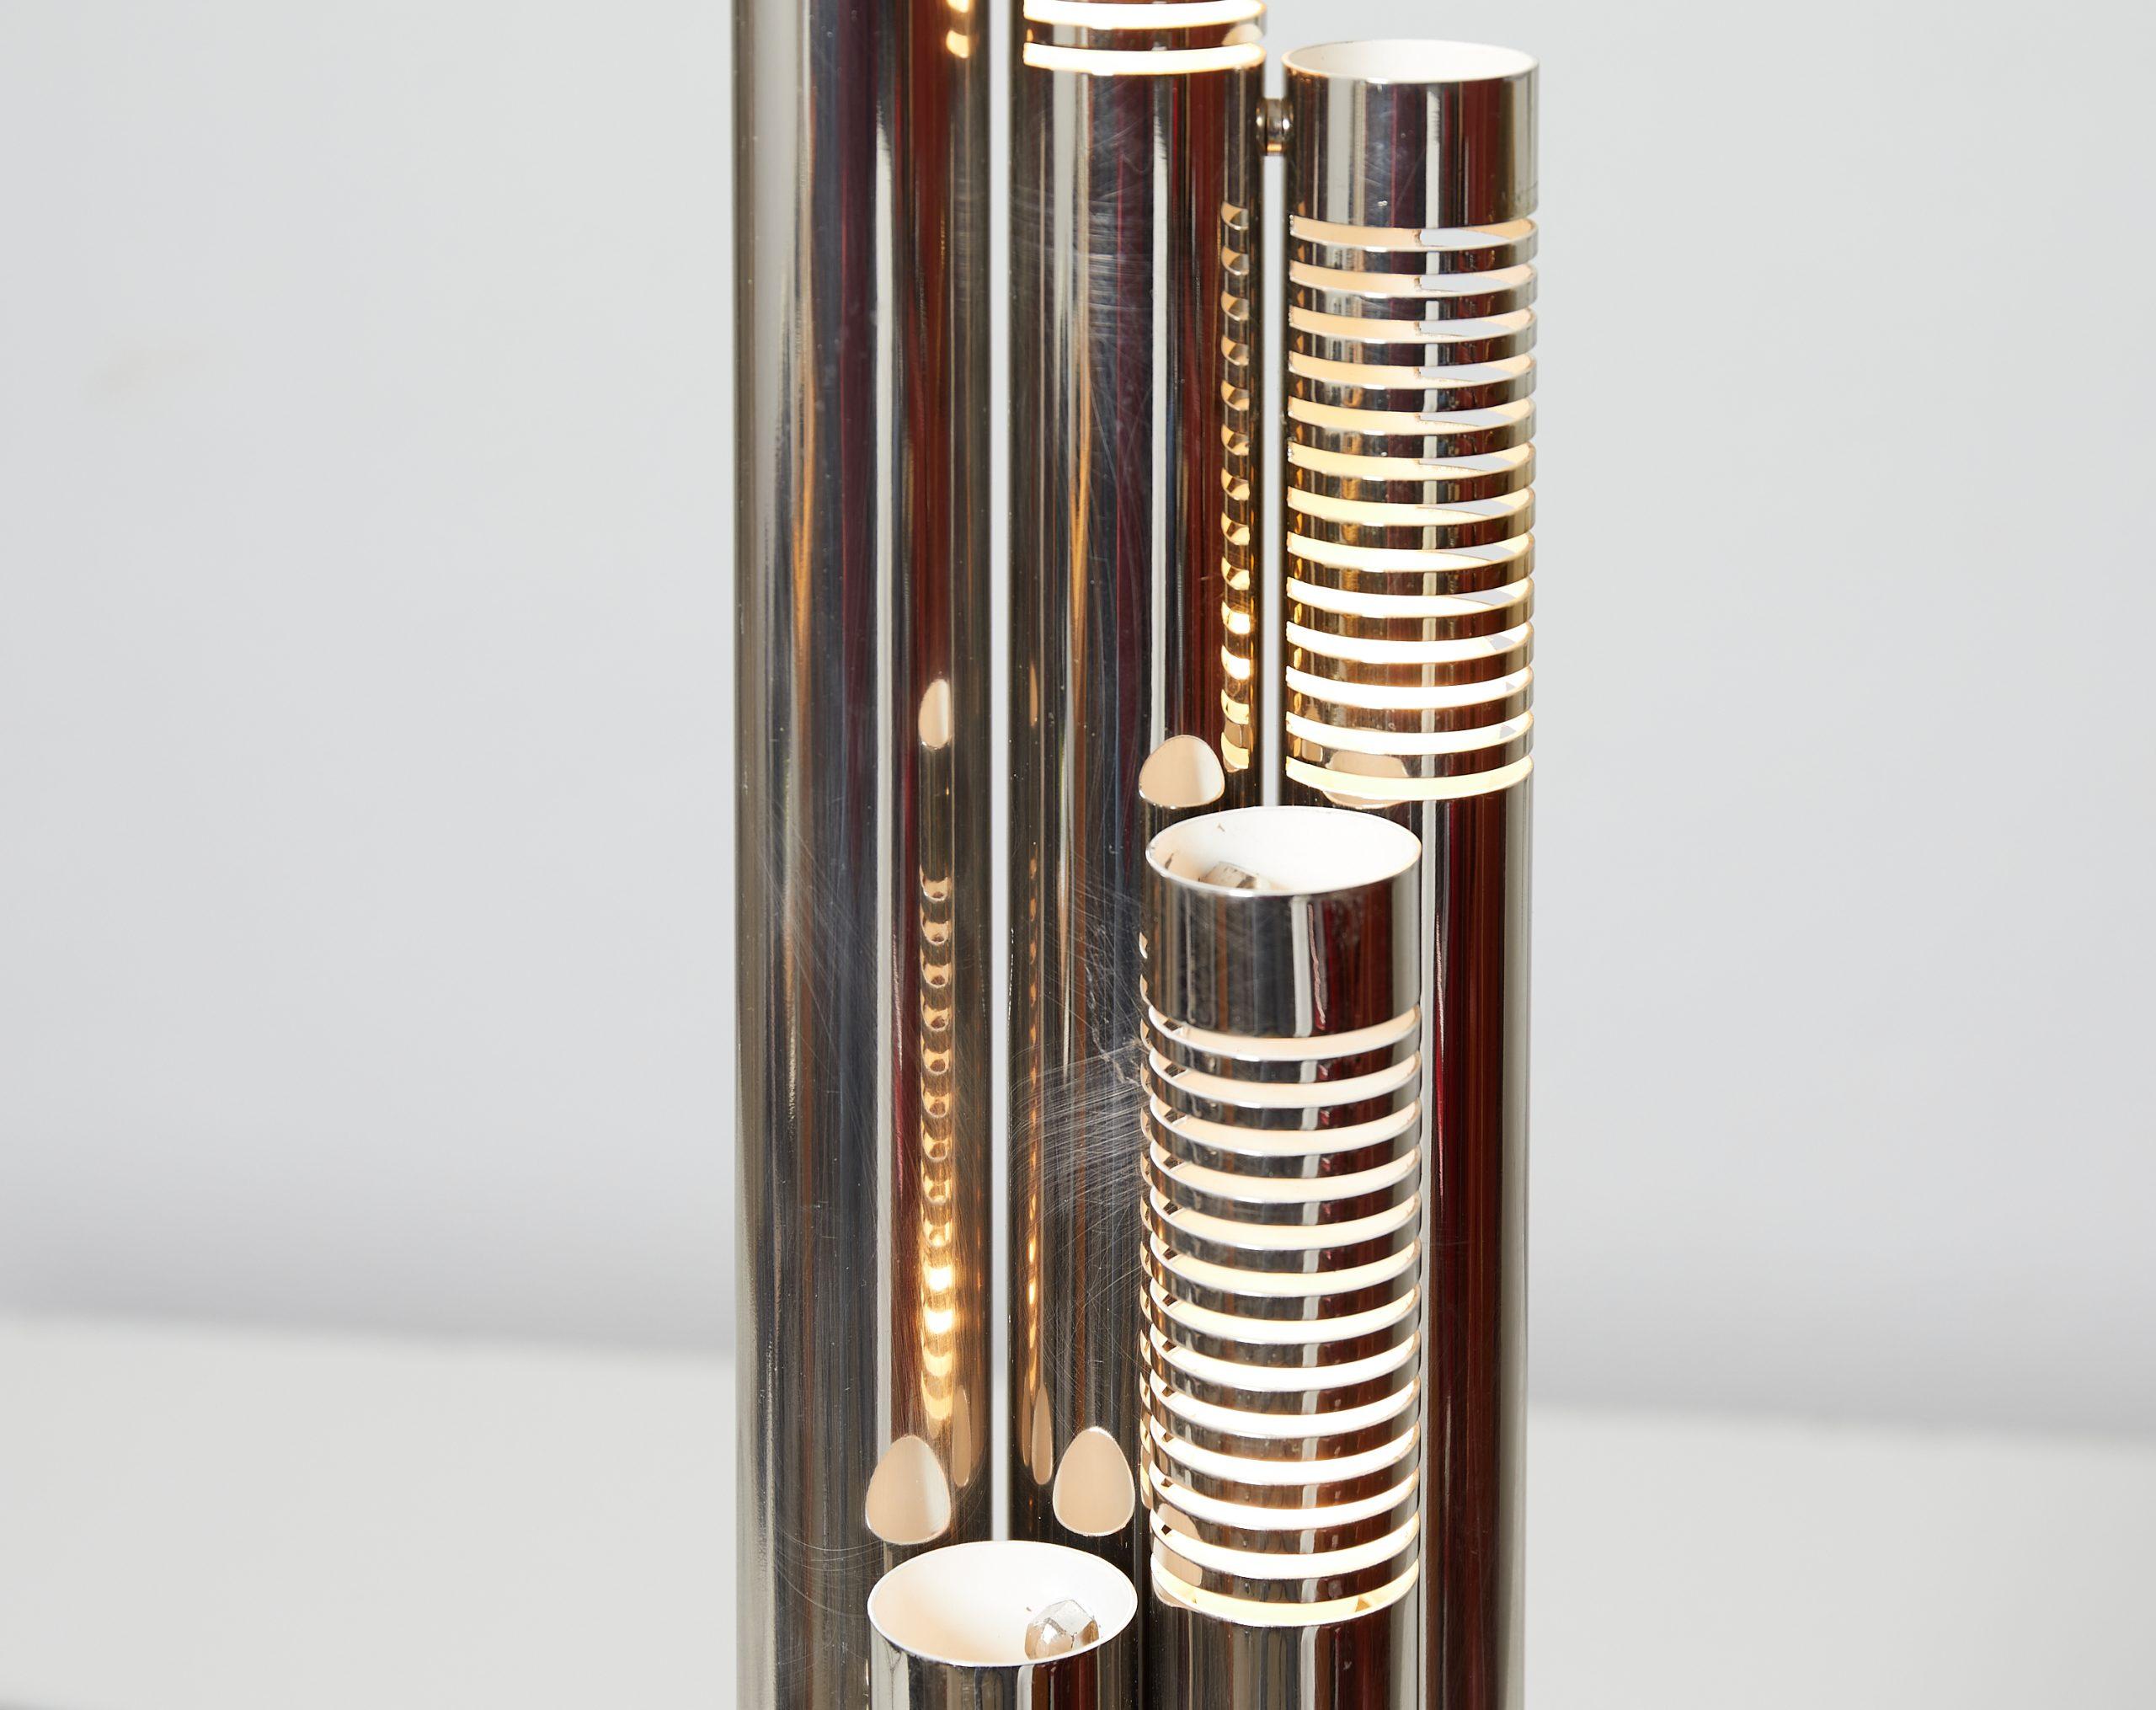 italian-chromed-metal-tubular-table-lamp-c-1970-image-04